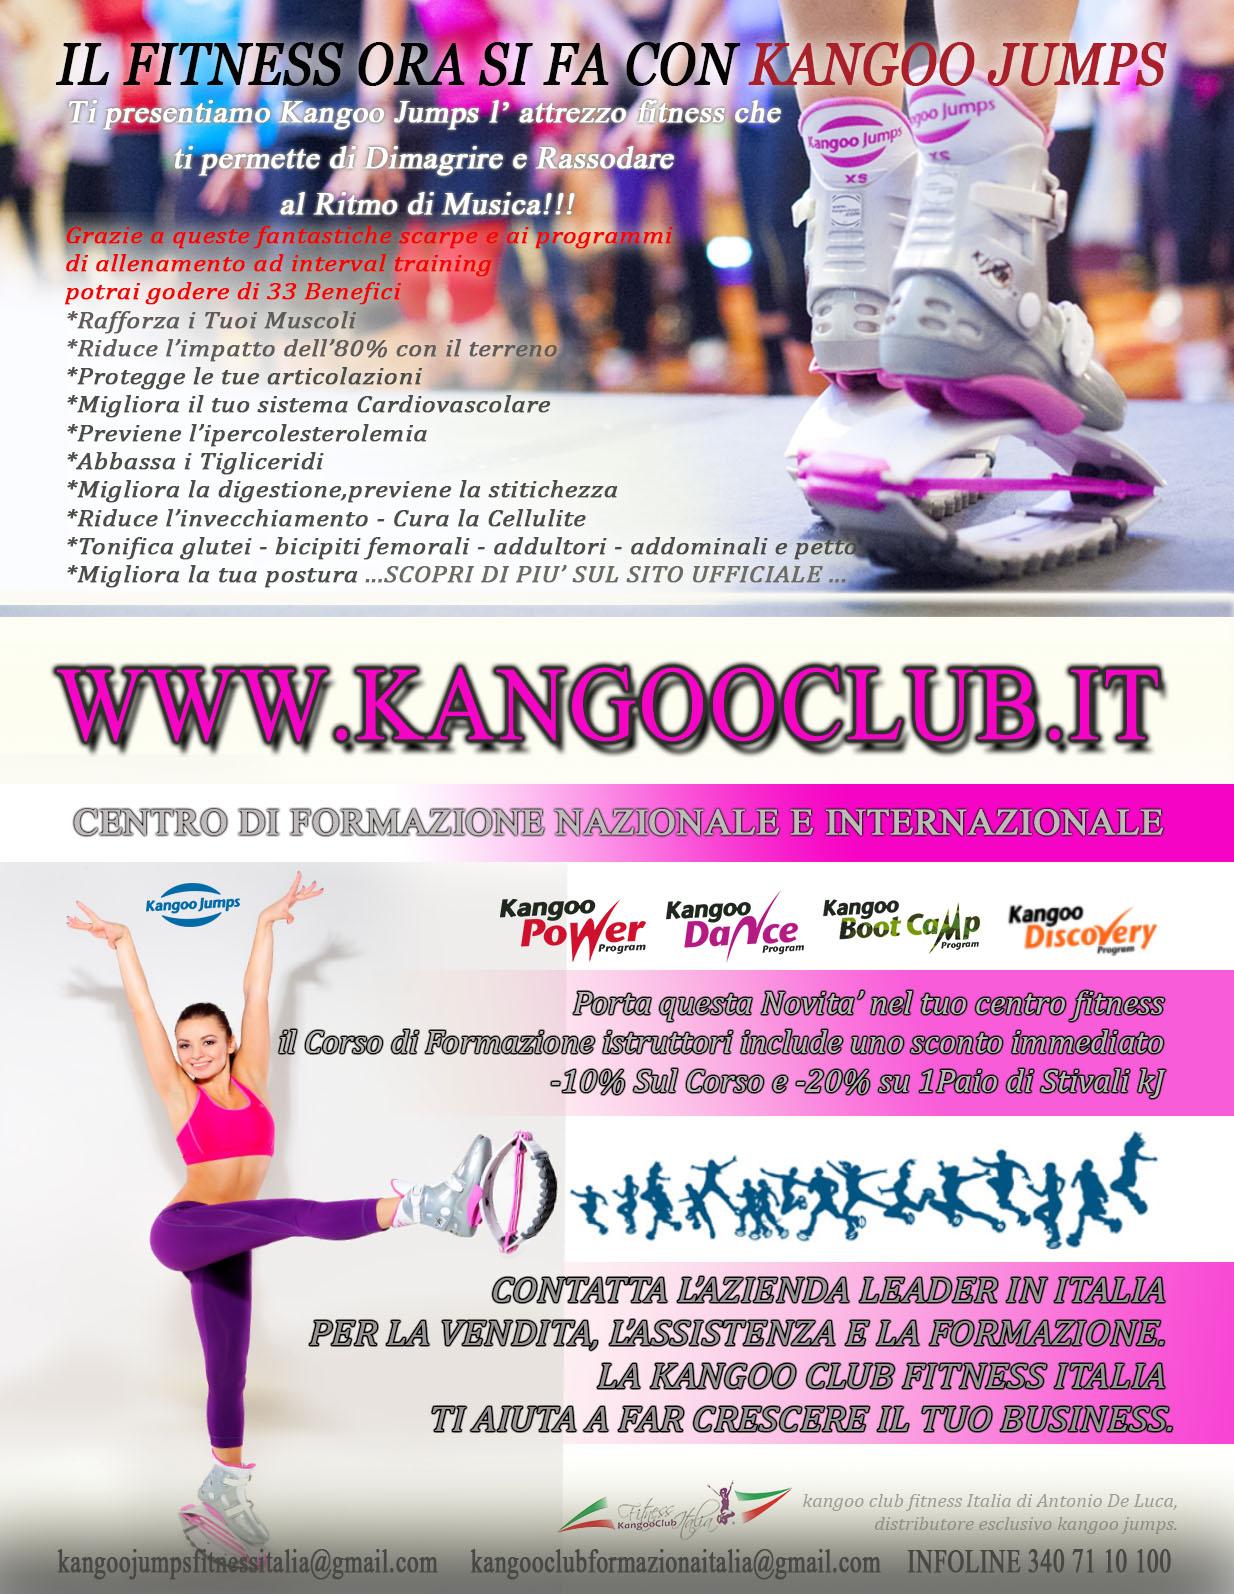 Formazione Kangoo Jumps Kangoo Jumps Rebound Exercise Shoes Low